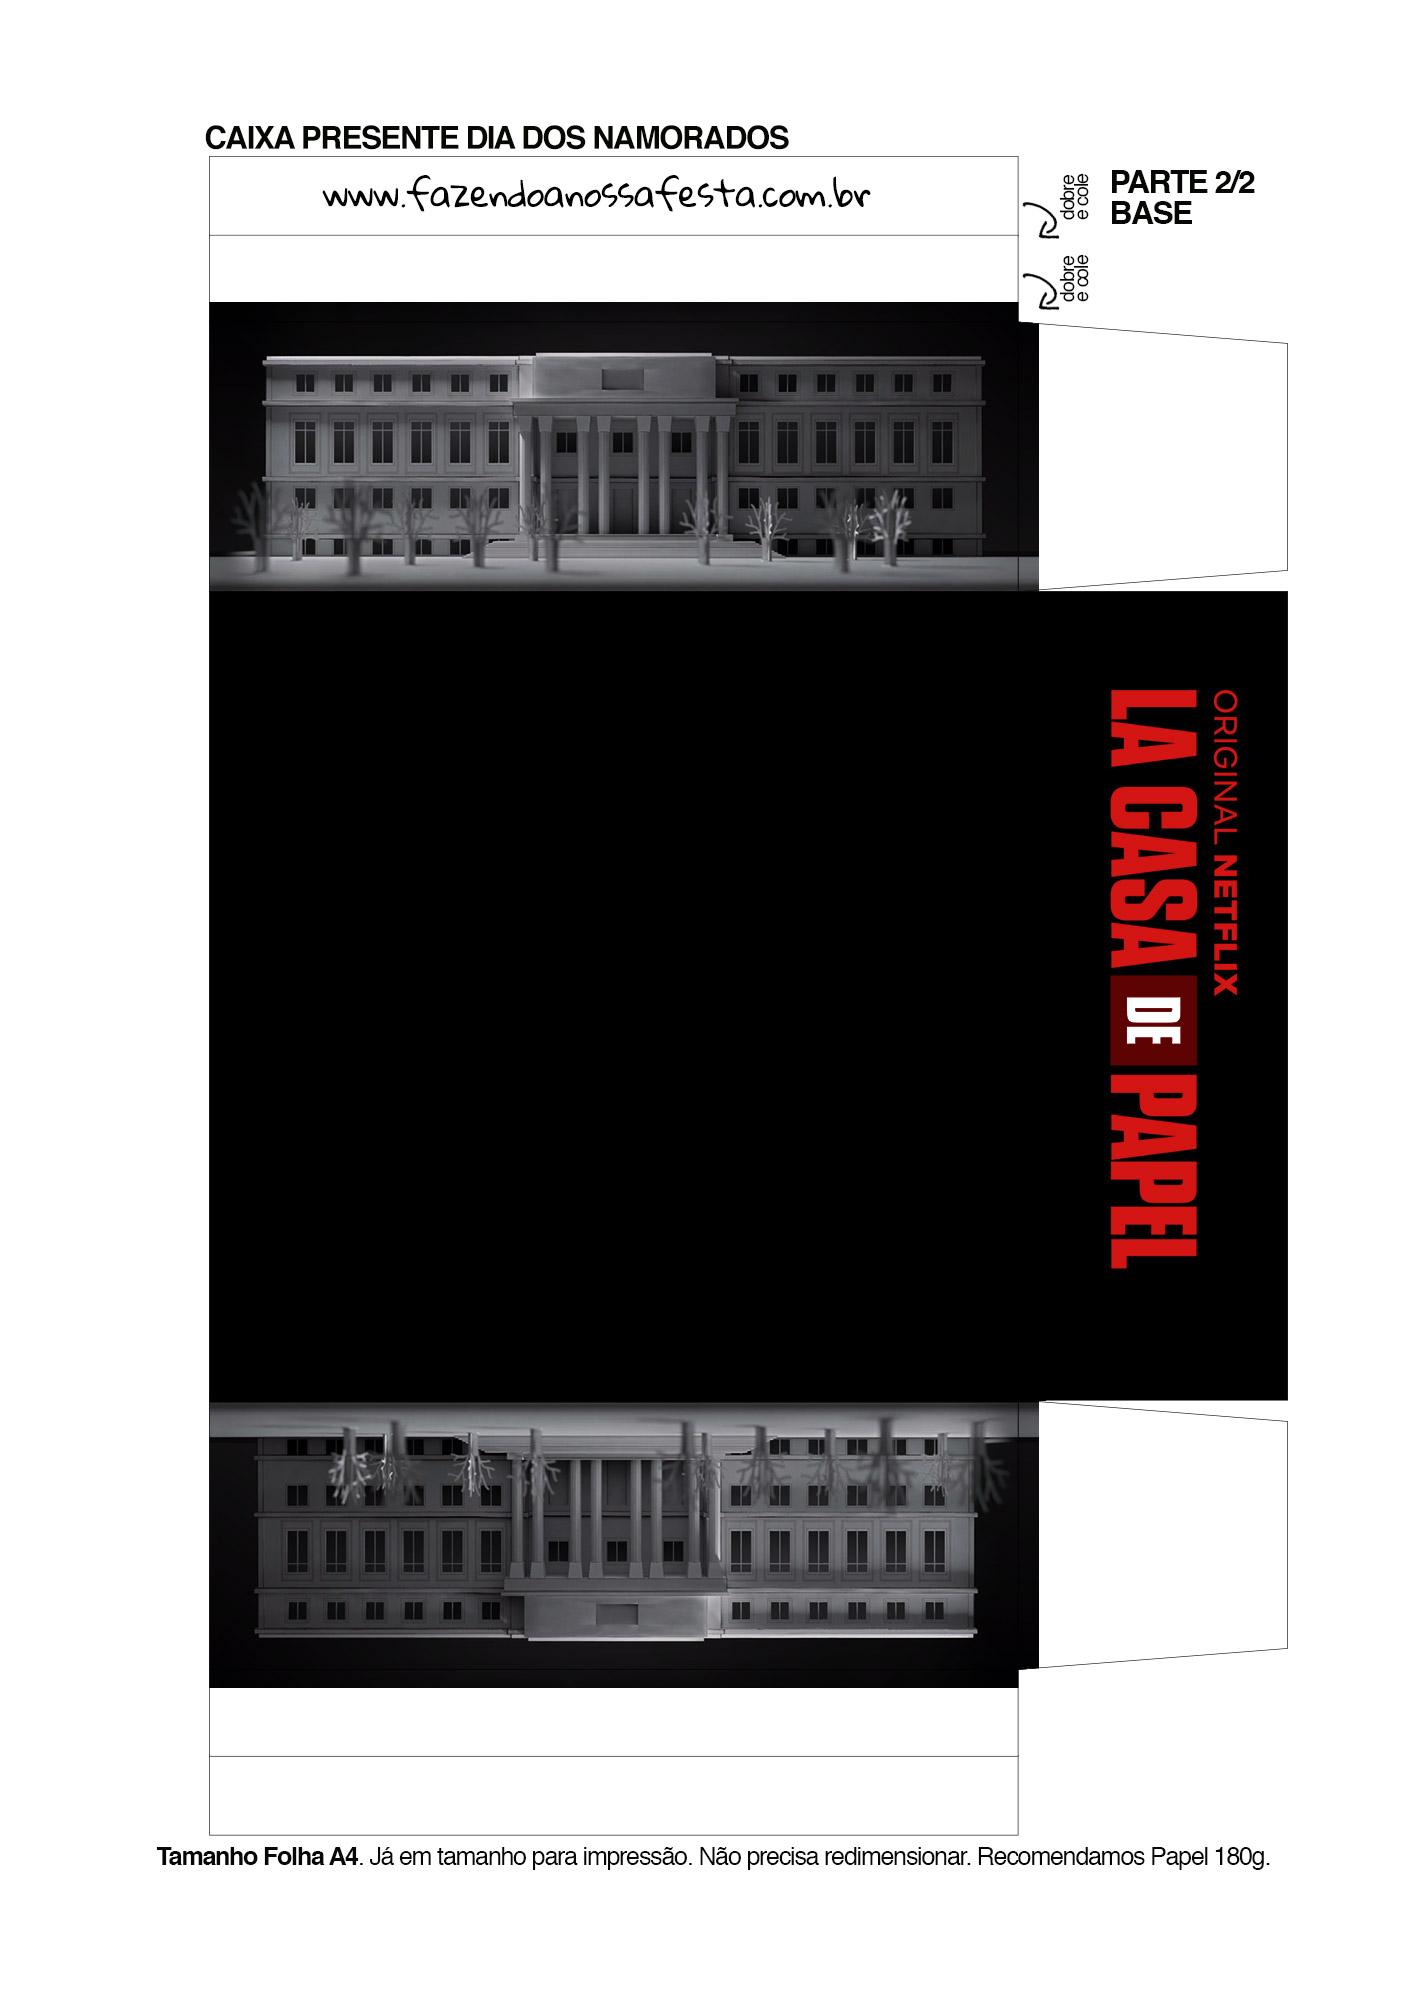 Caixa Brigadeiro La Casa de Papel la casa de papel 4